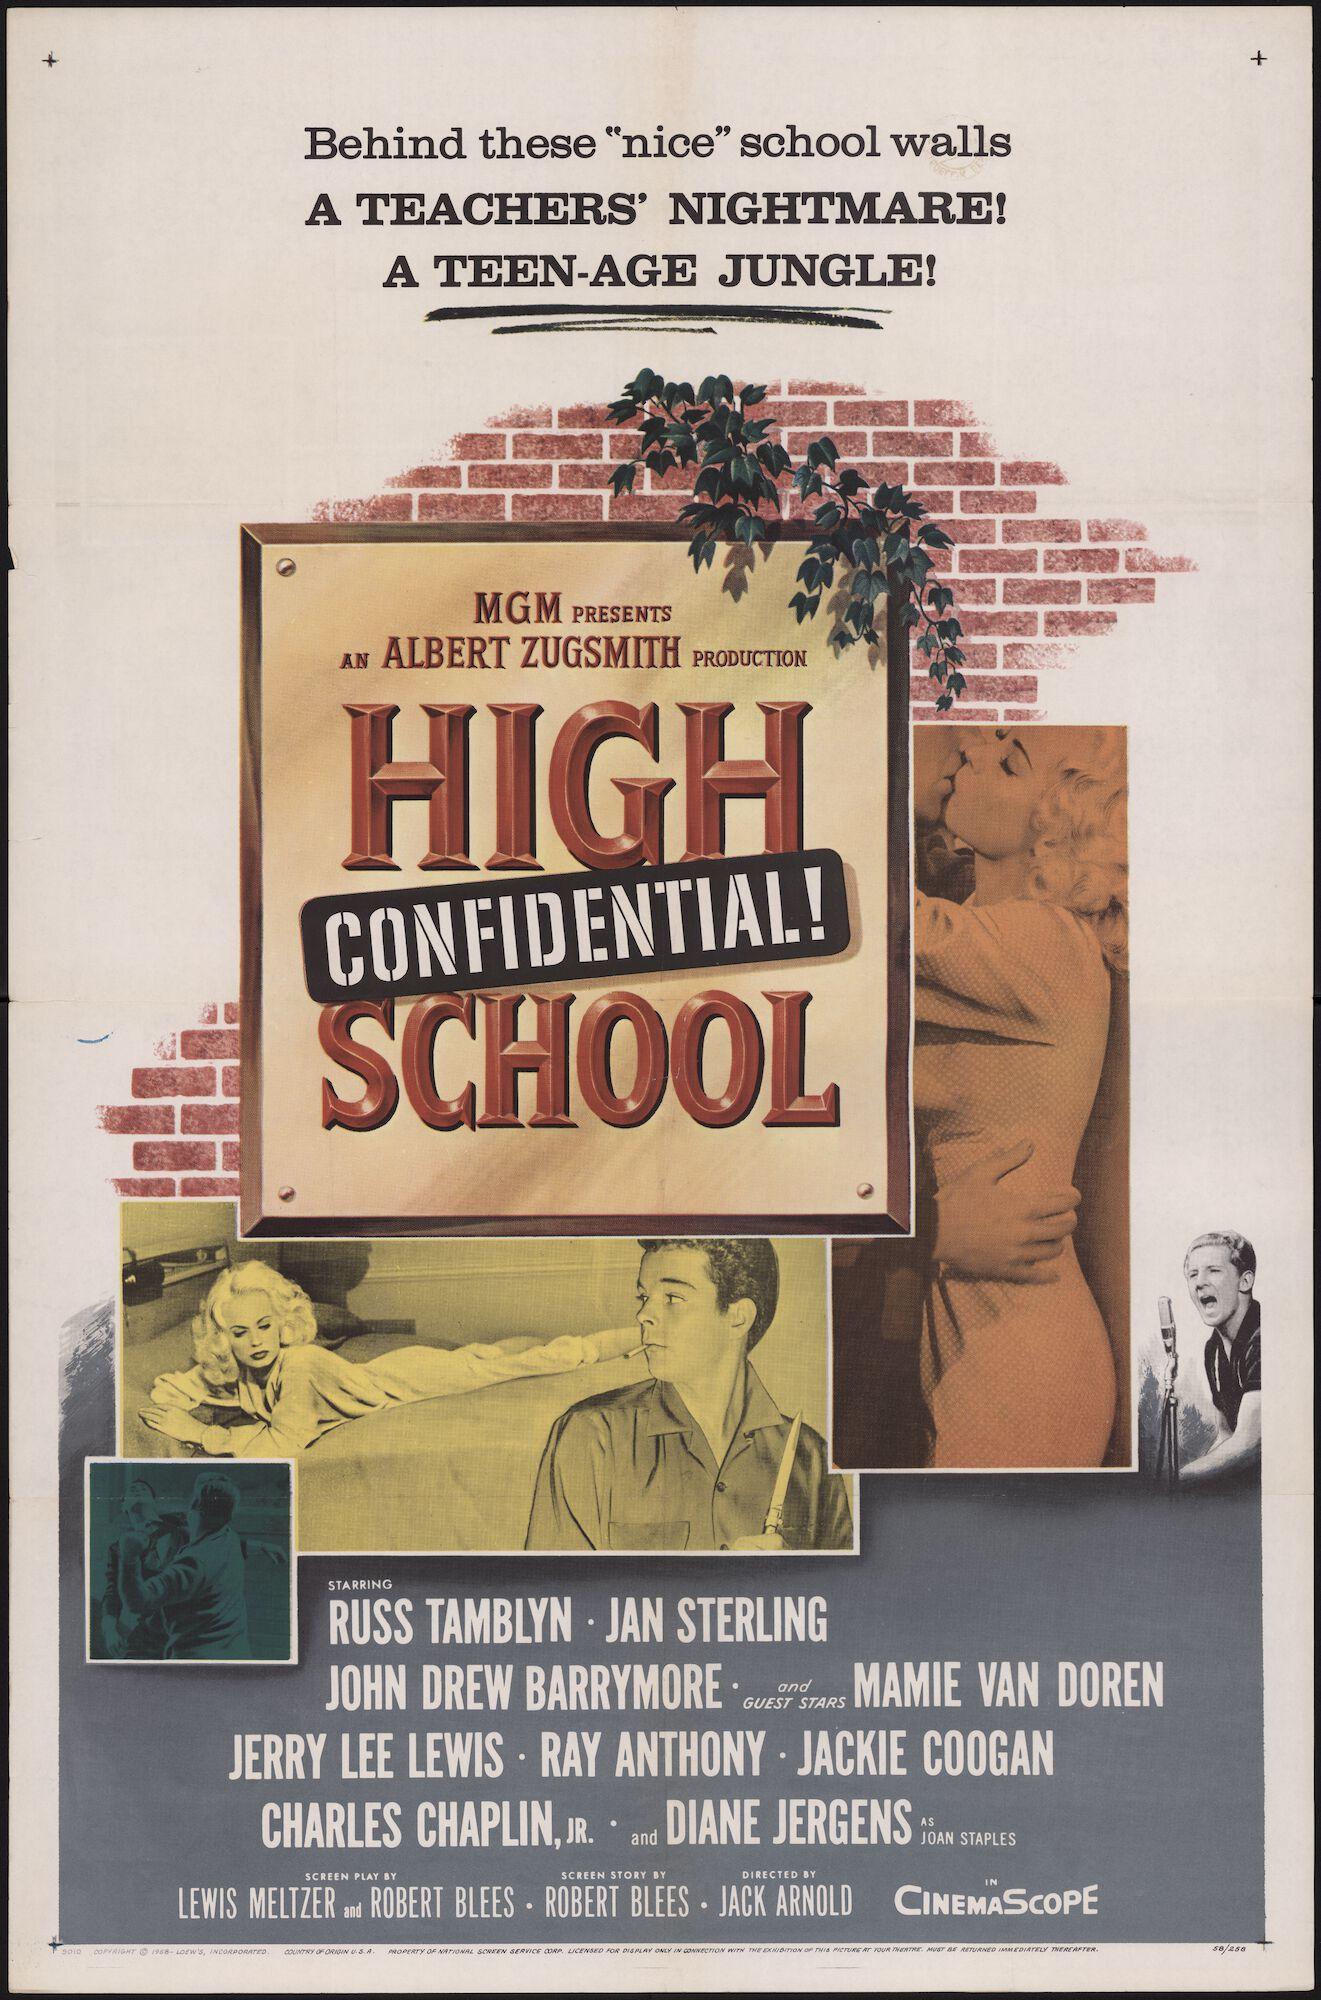 High School Confidential!, [Majestic], Gent, juni 1959